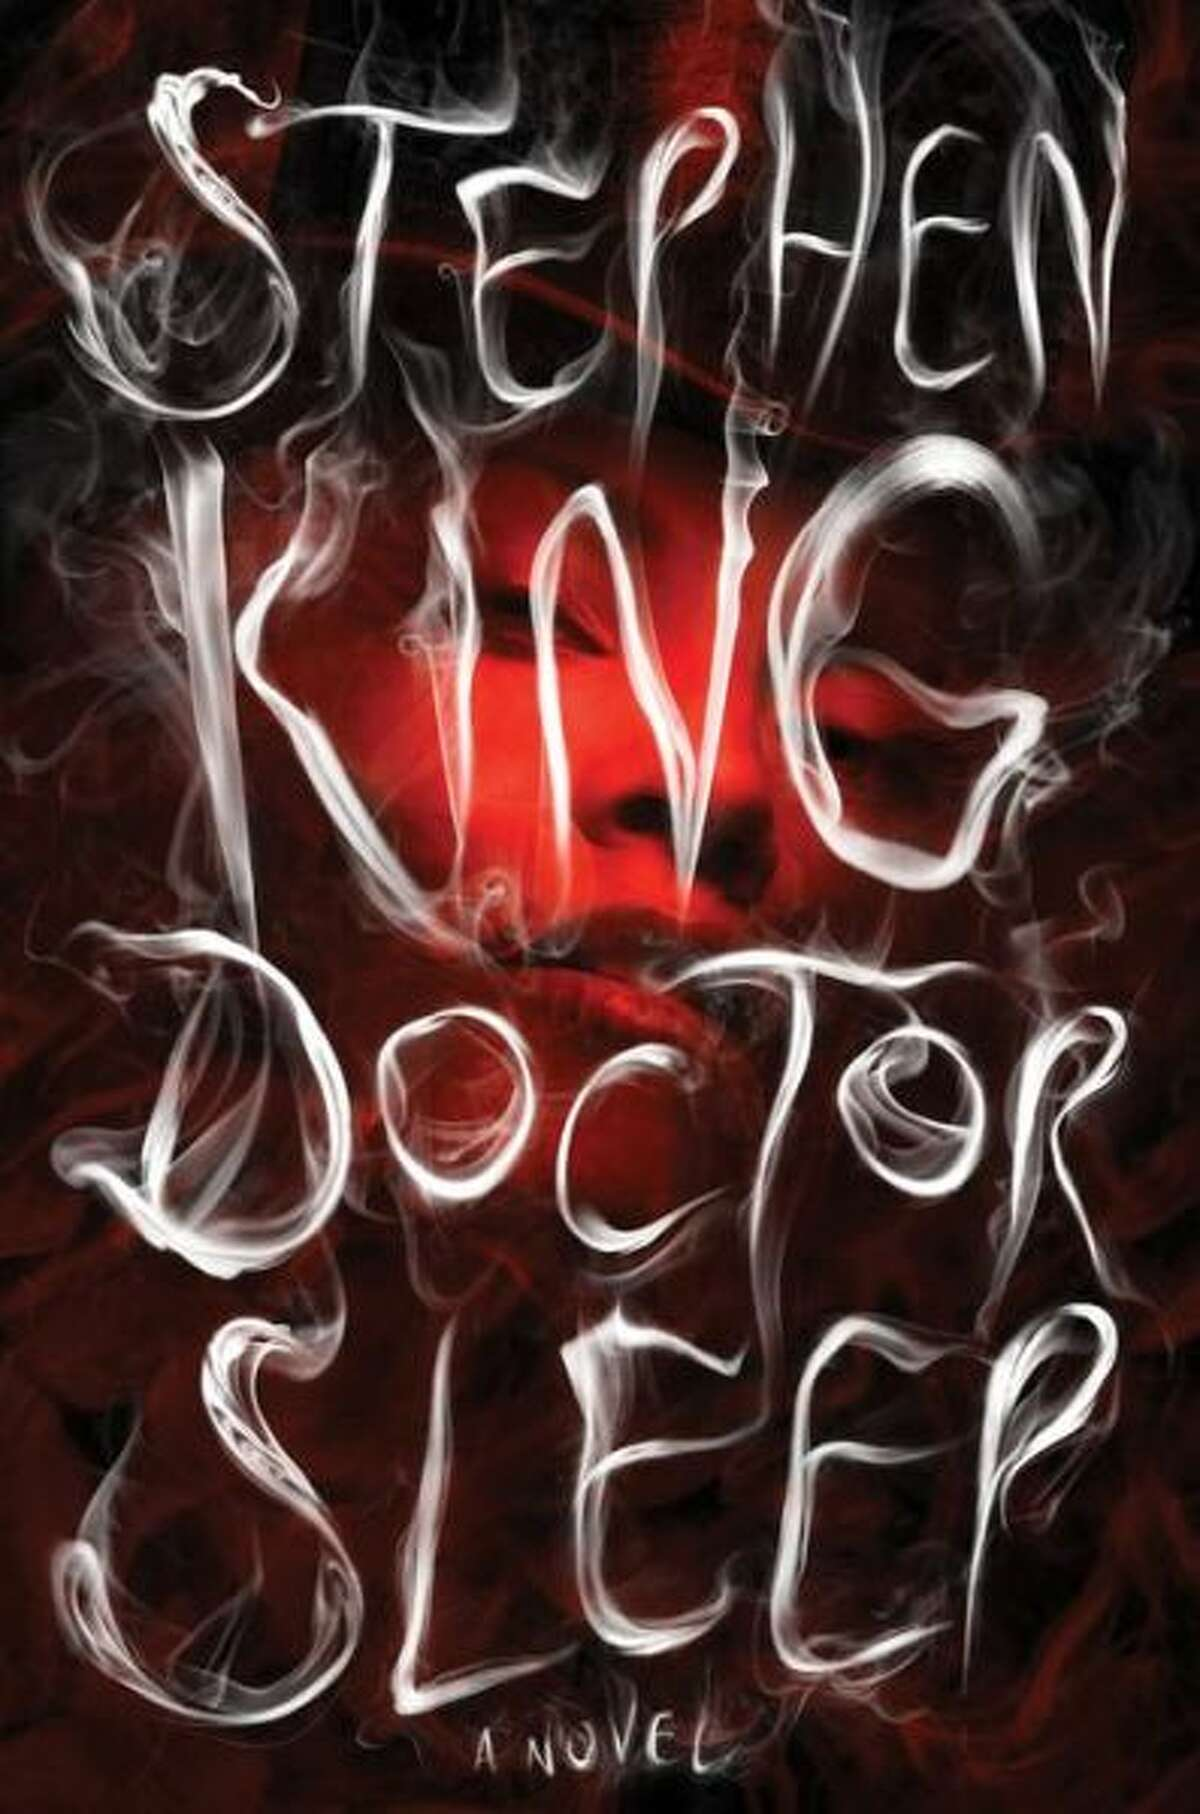 Doctor Sleep, by Stephen King